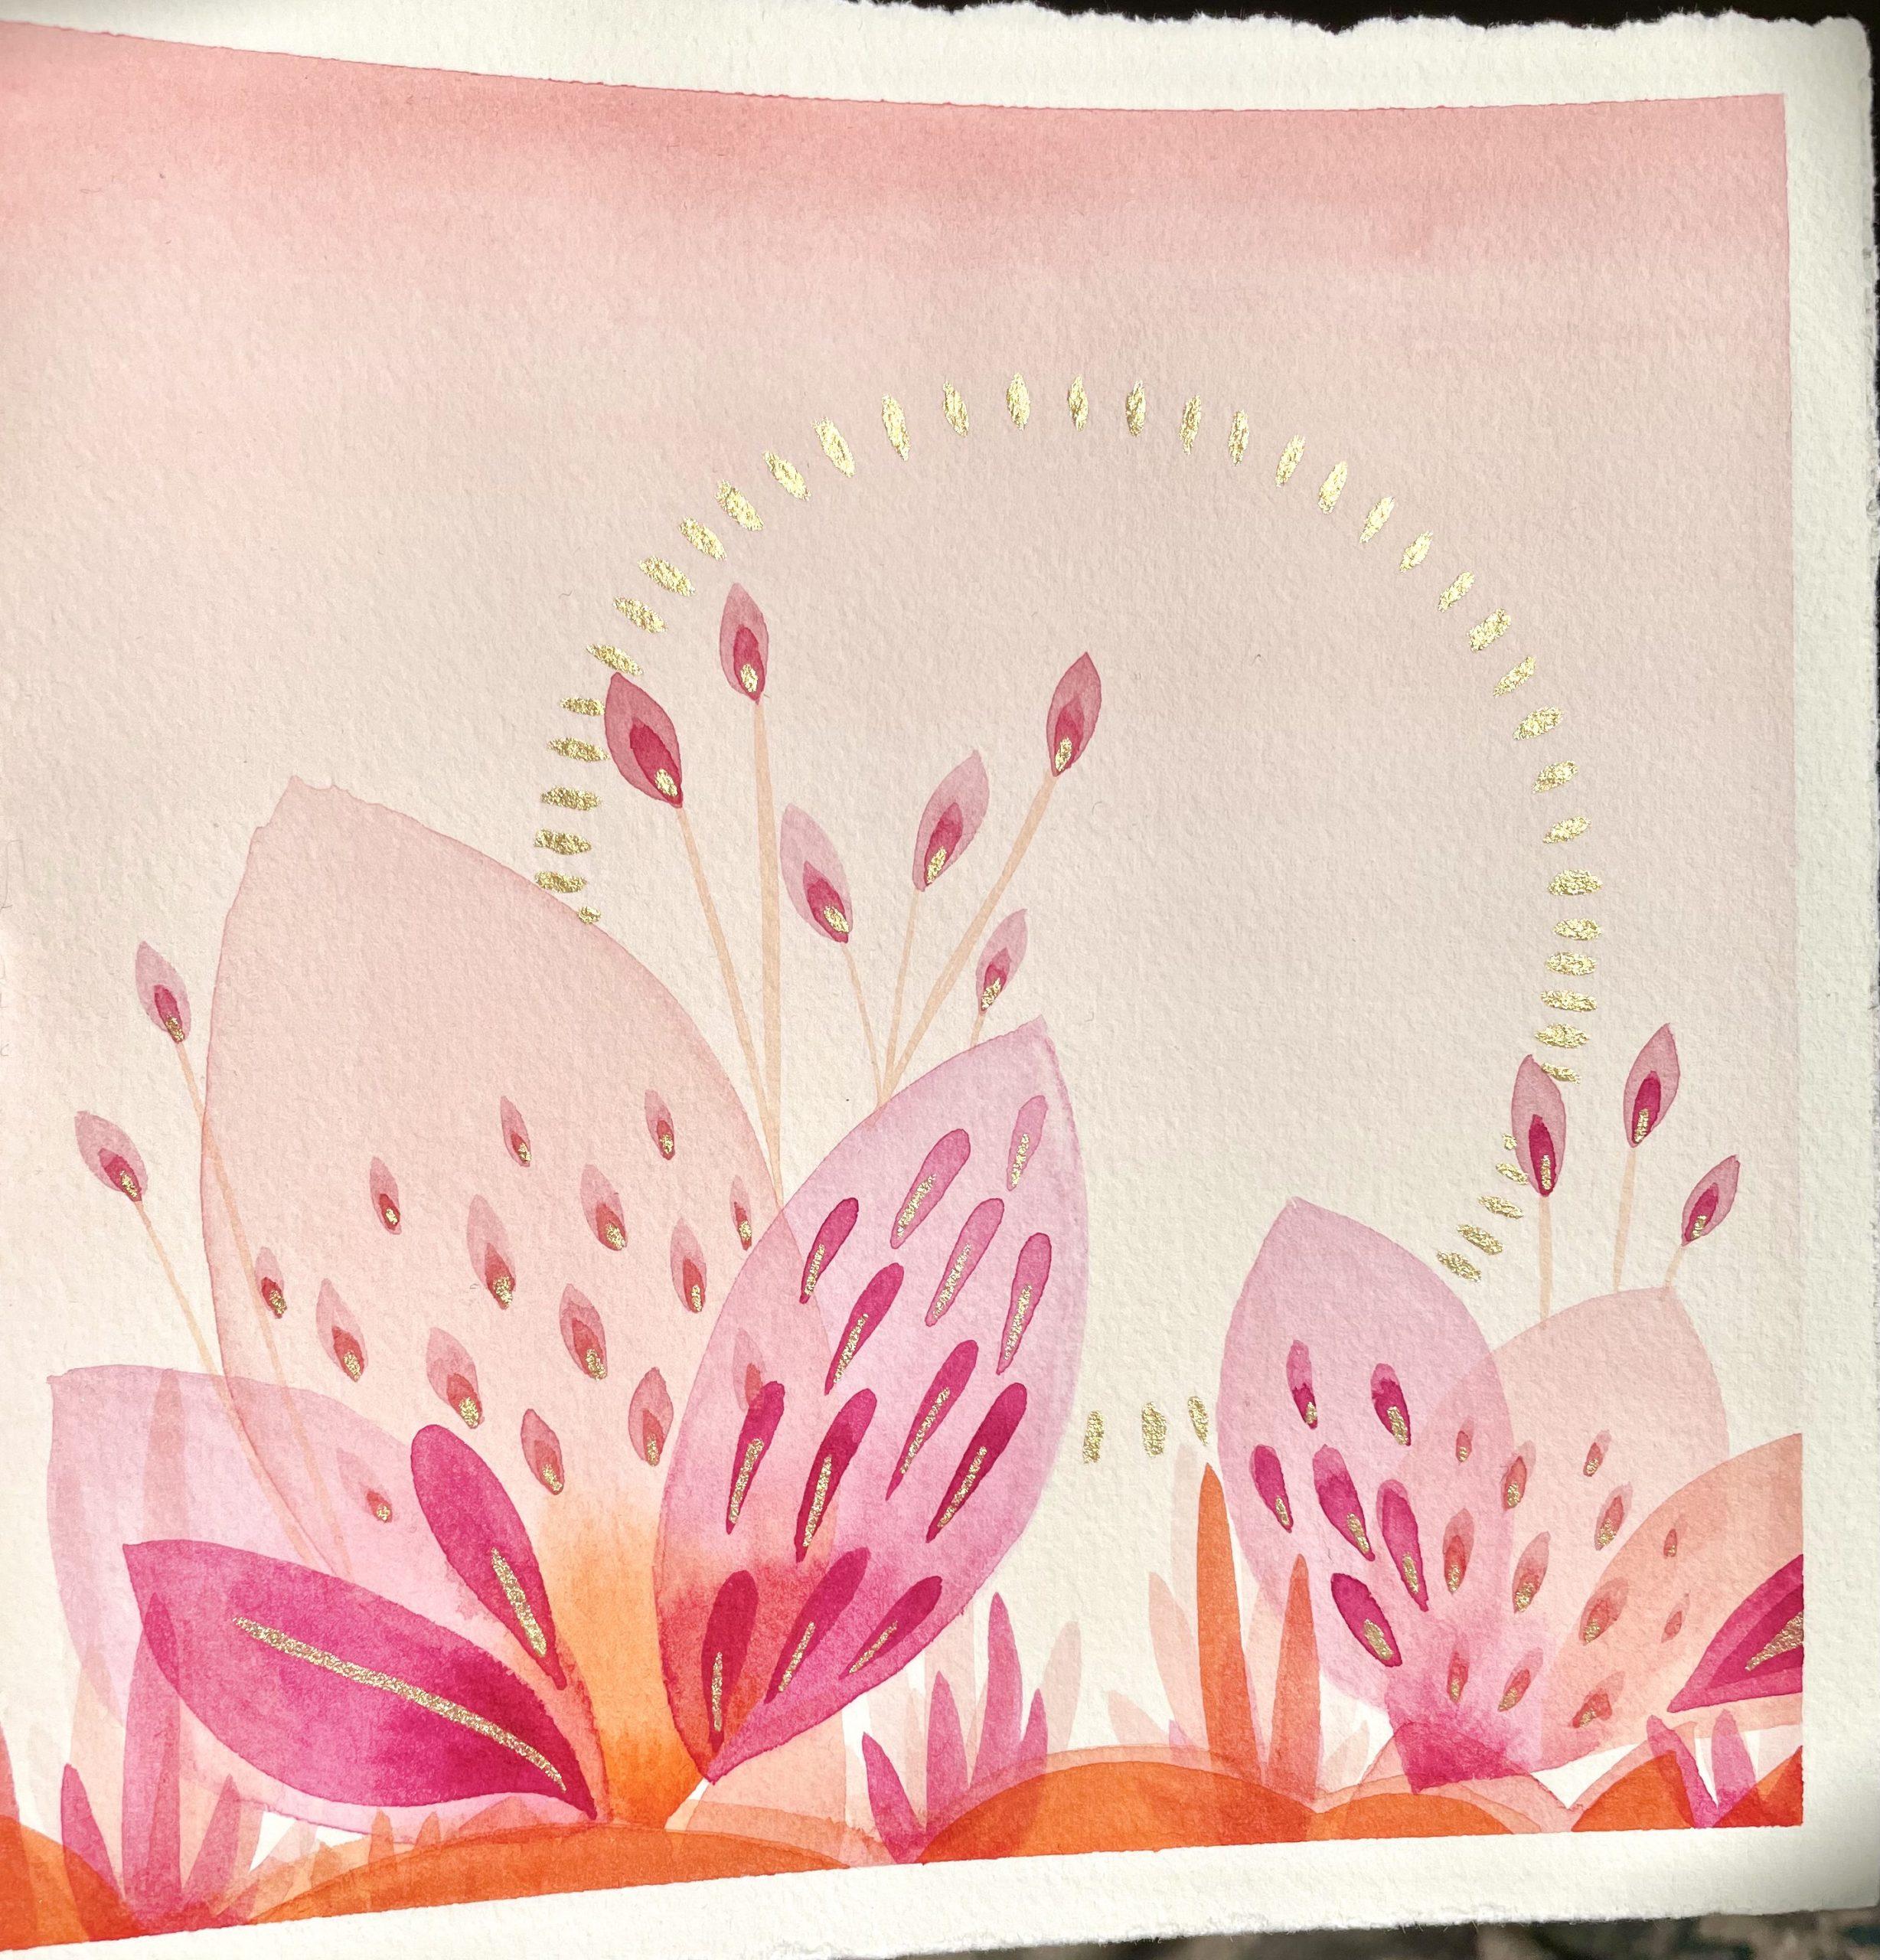 Abstract botanic watercolor art